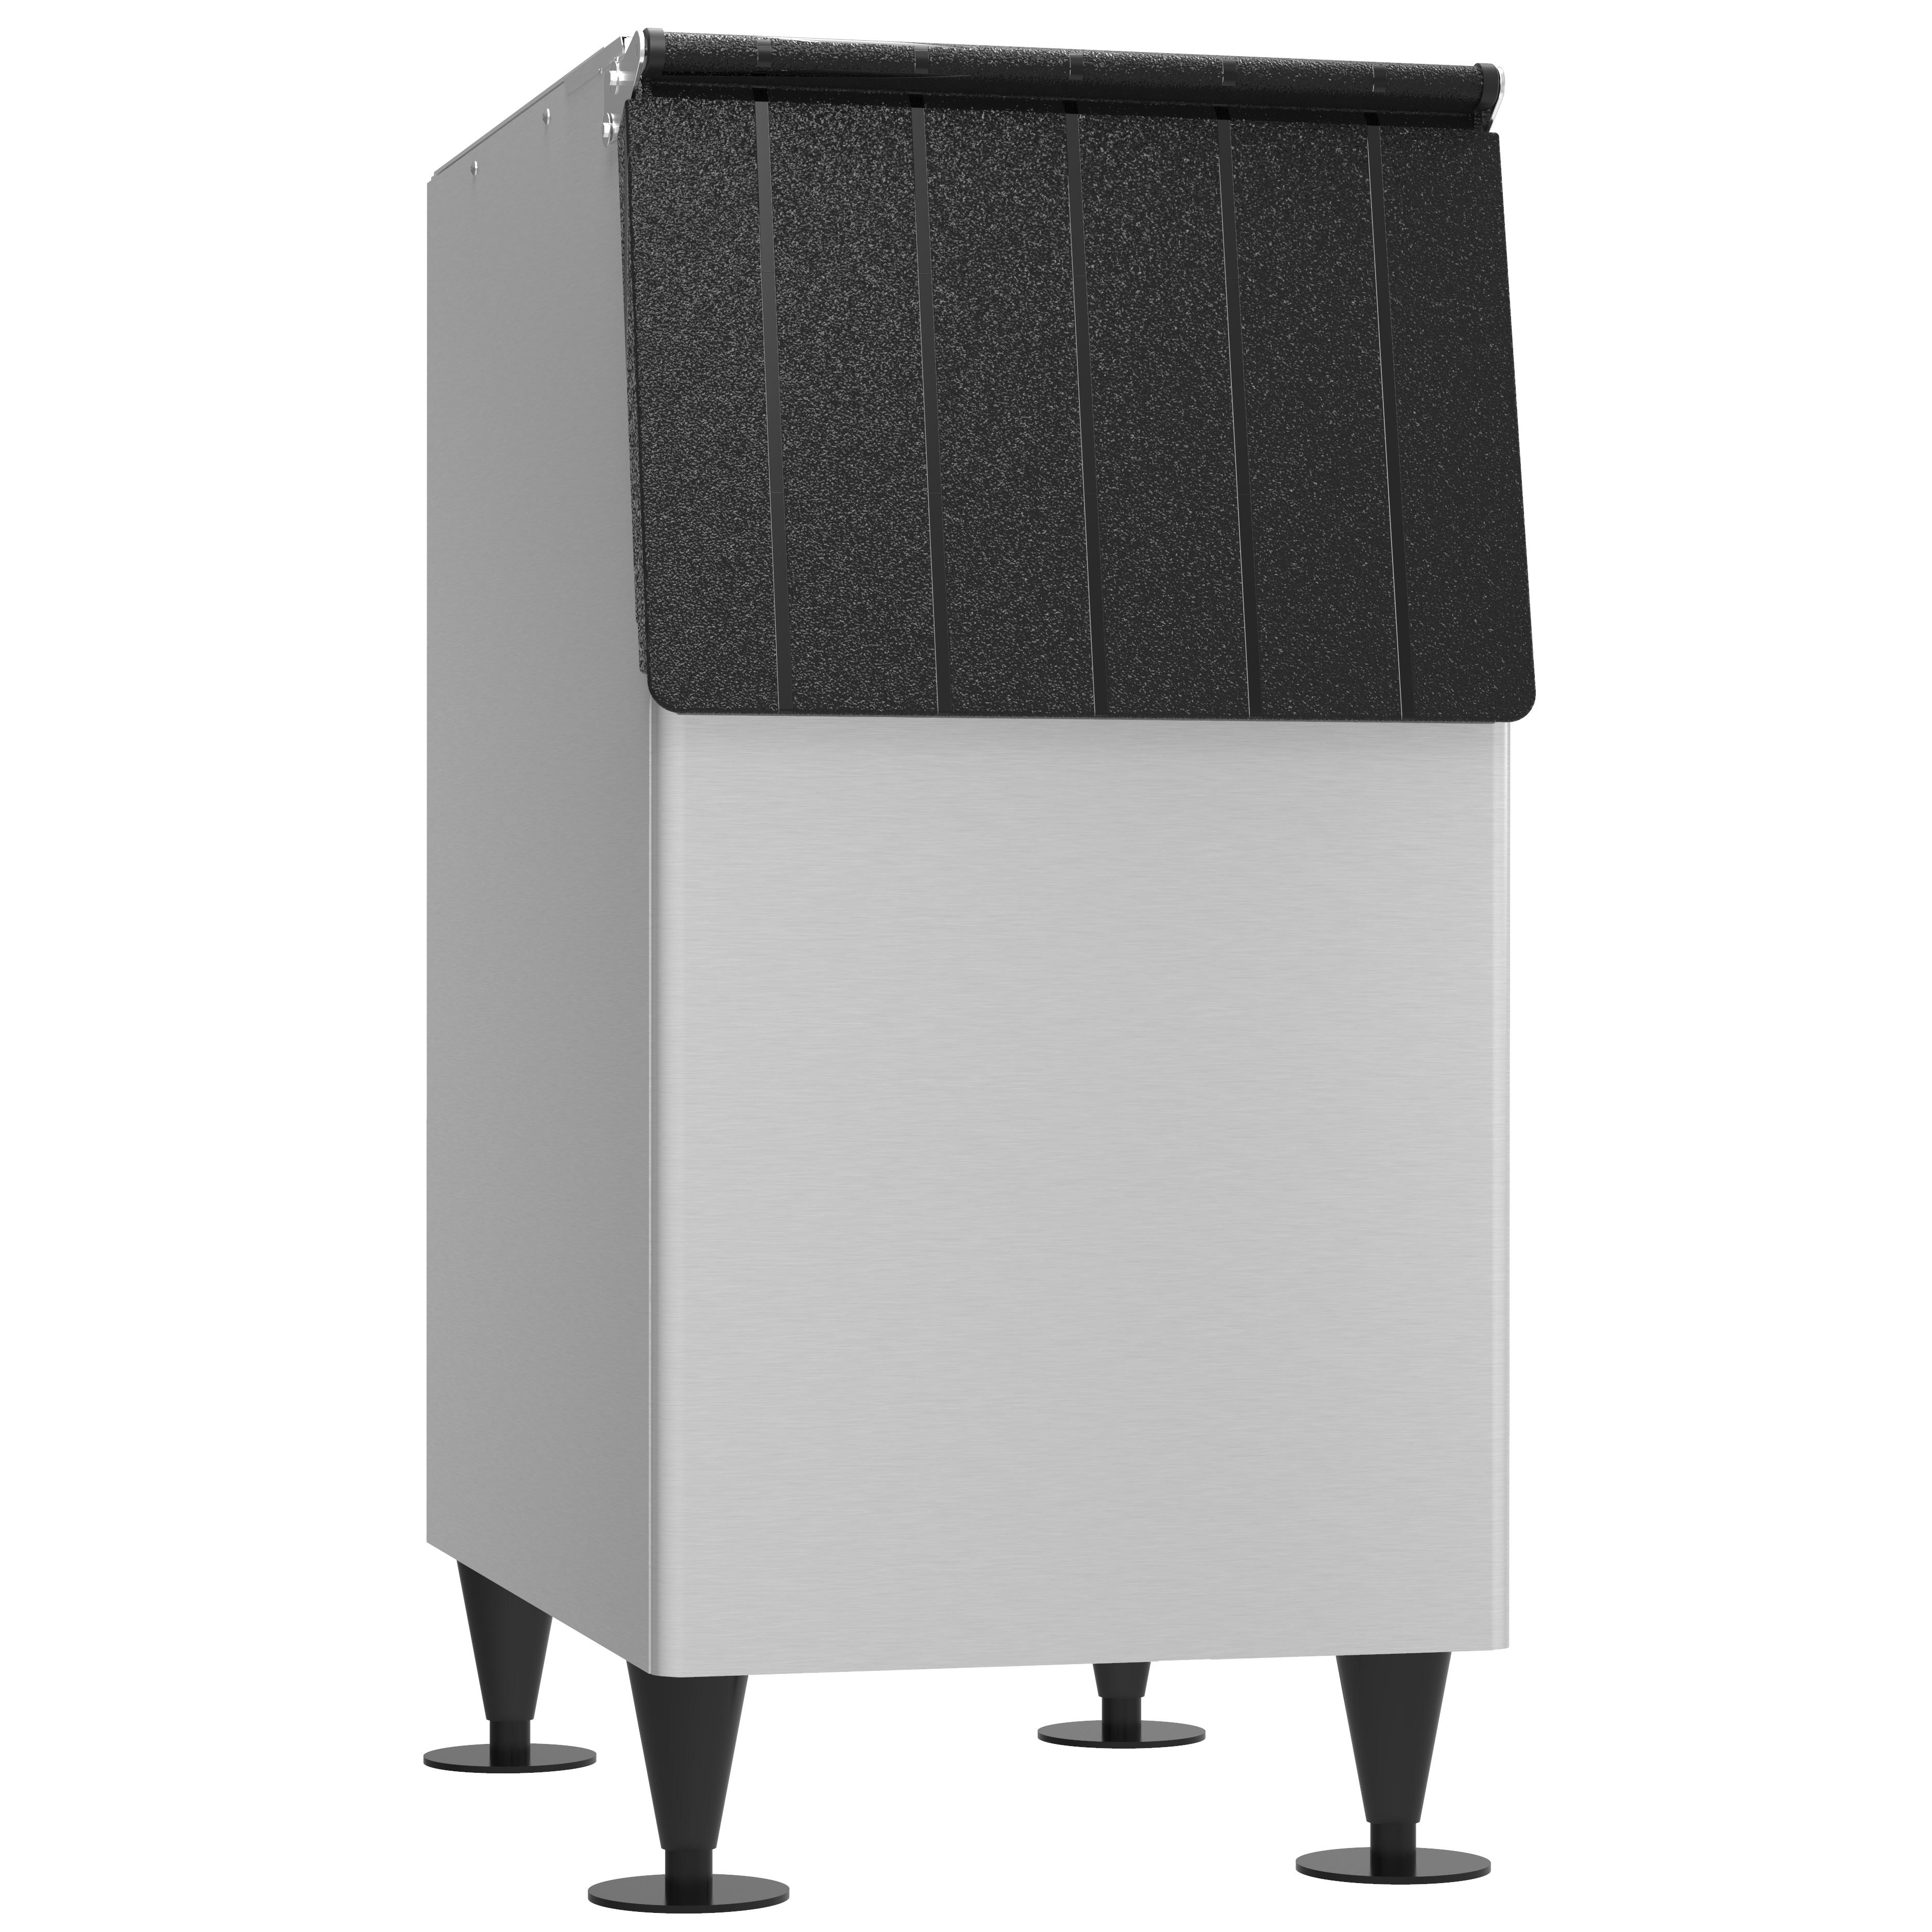 Hoshizaki BD-300SF ice cubers, ice storage & ice dispensers